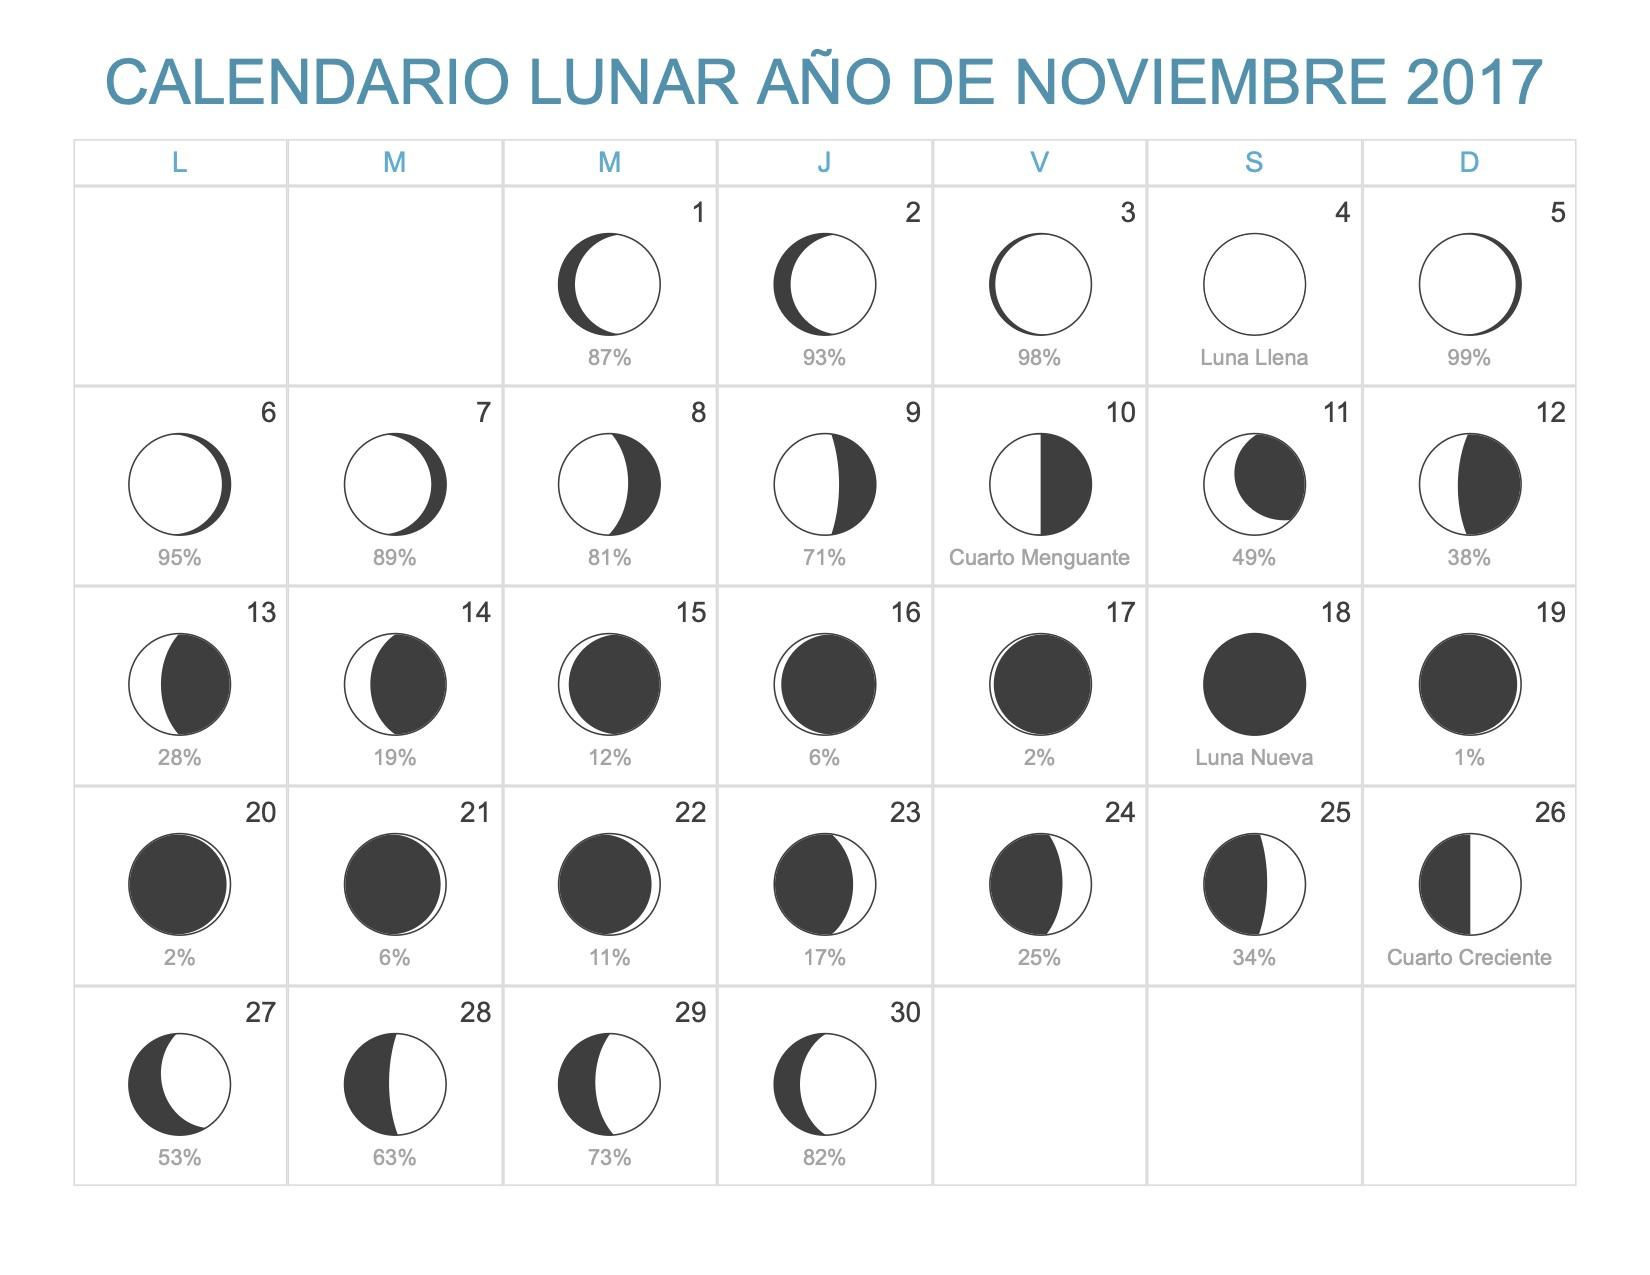 Calendario lunar noviembre 2017 for Almanaque lunar 2017